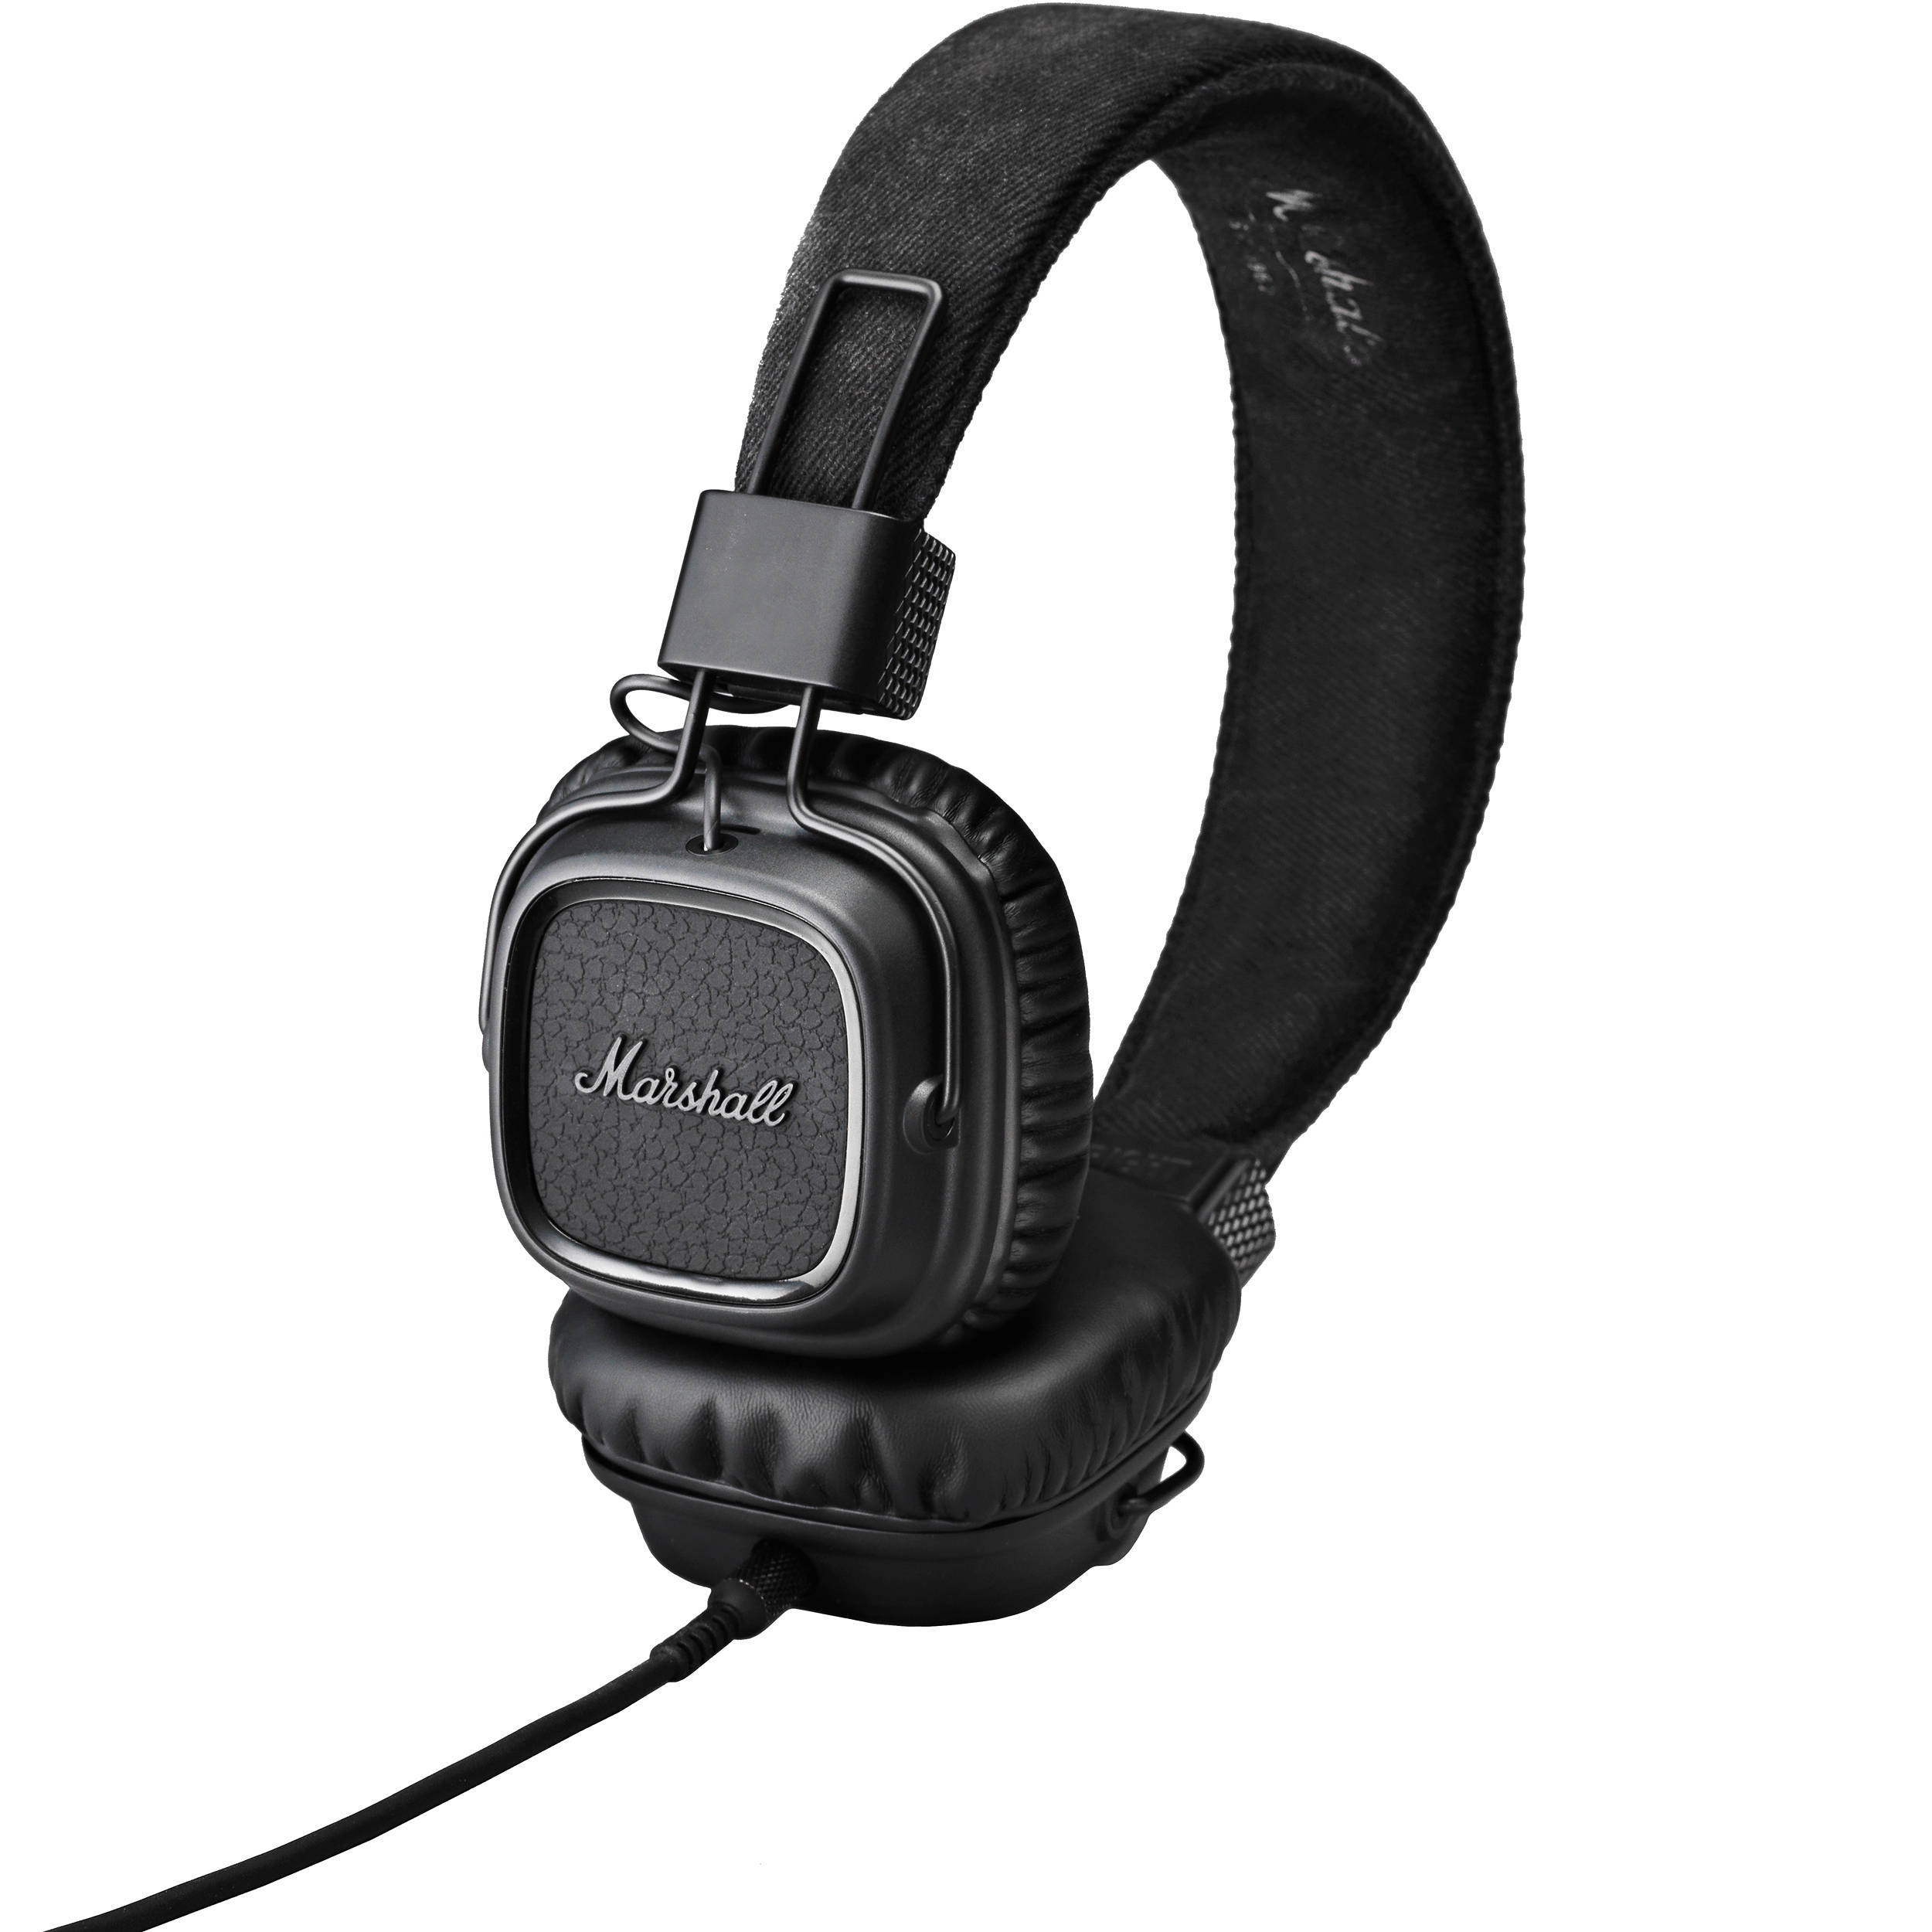 marshall audio major ii headphones pitch black 4091114 b h. Black Bedroom Furniture Sets. Home Design Ideas